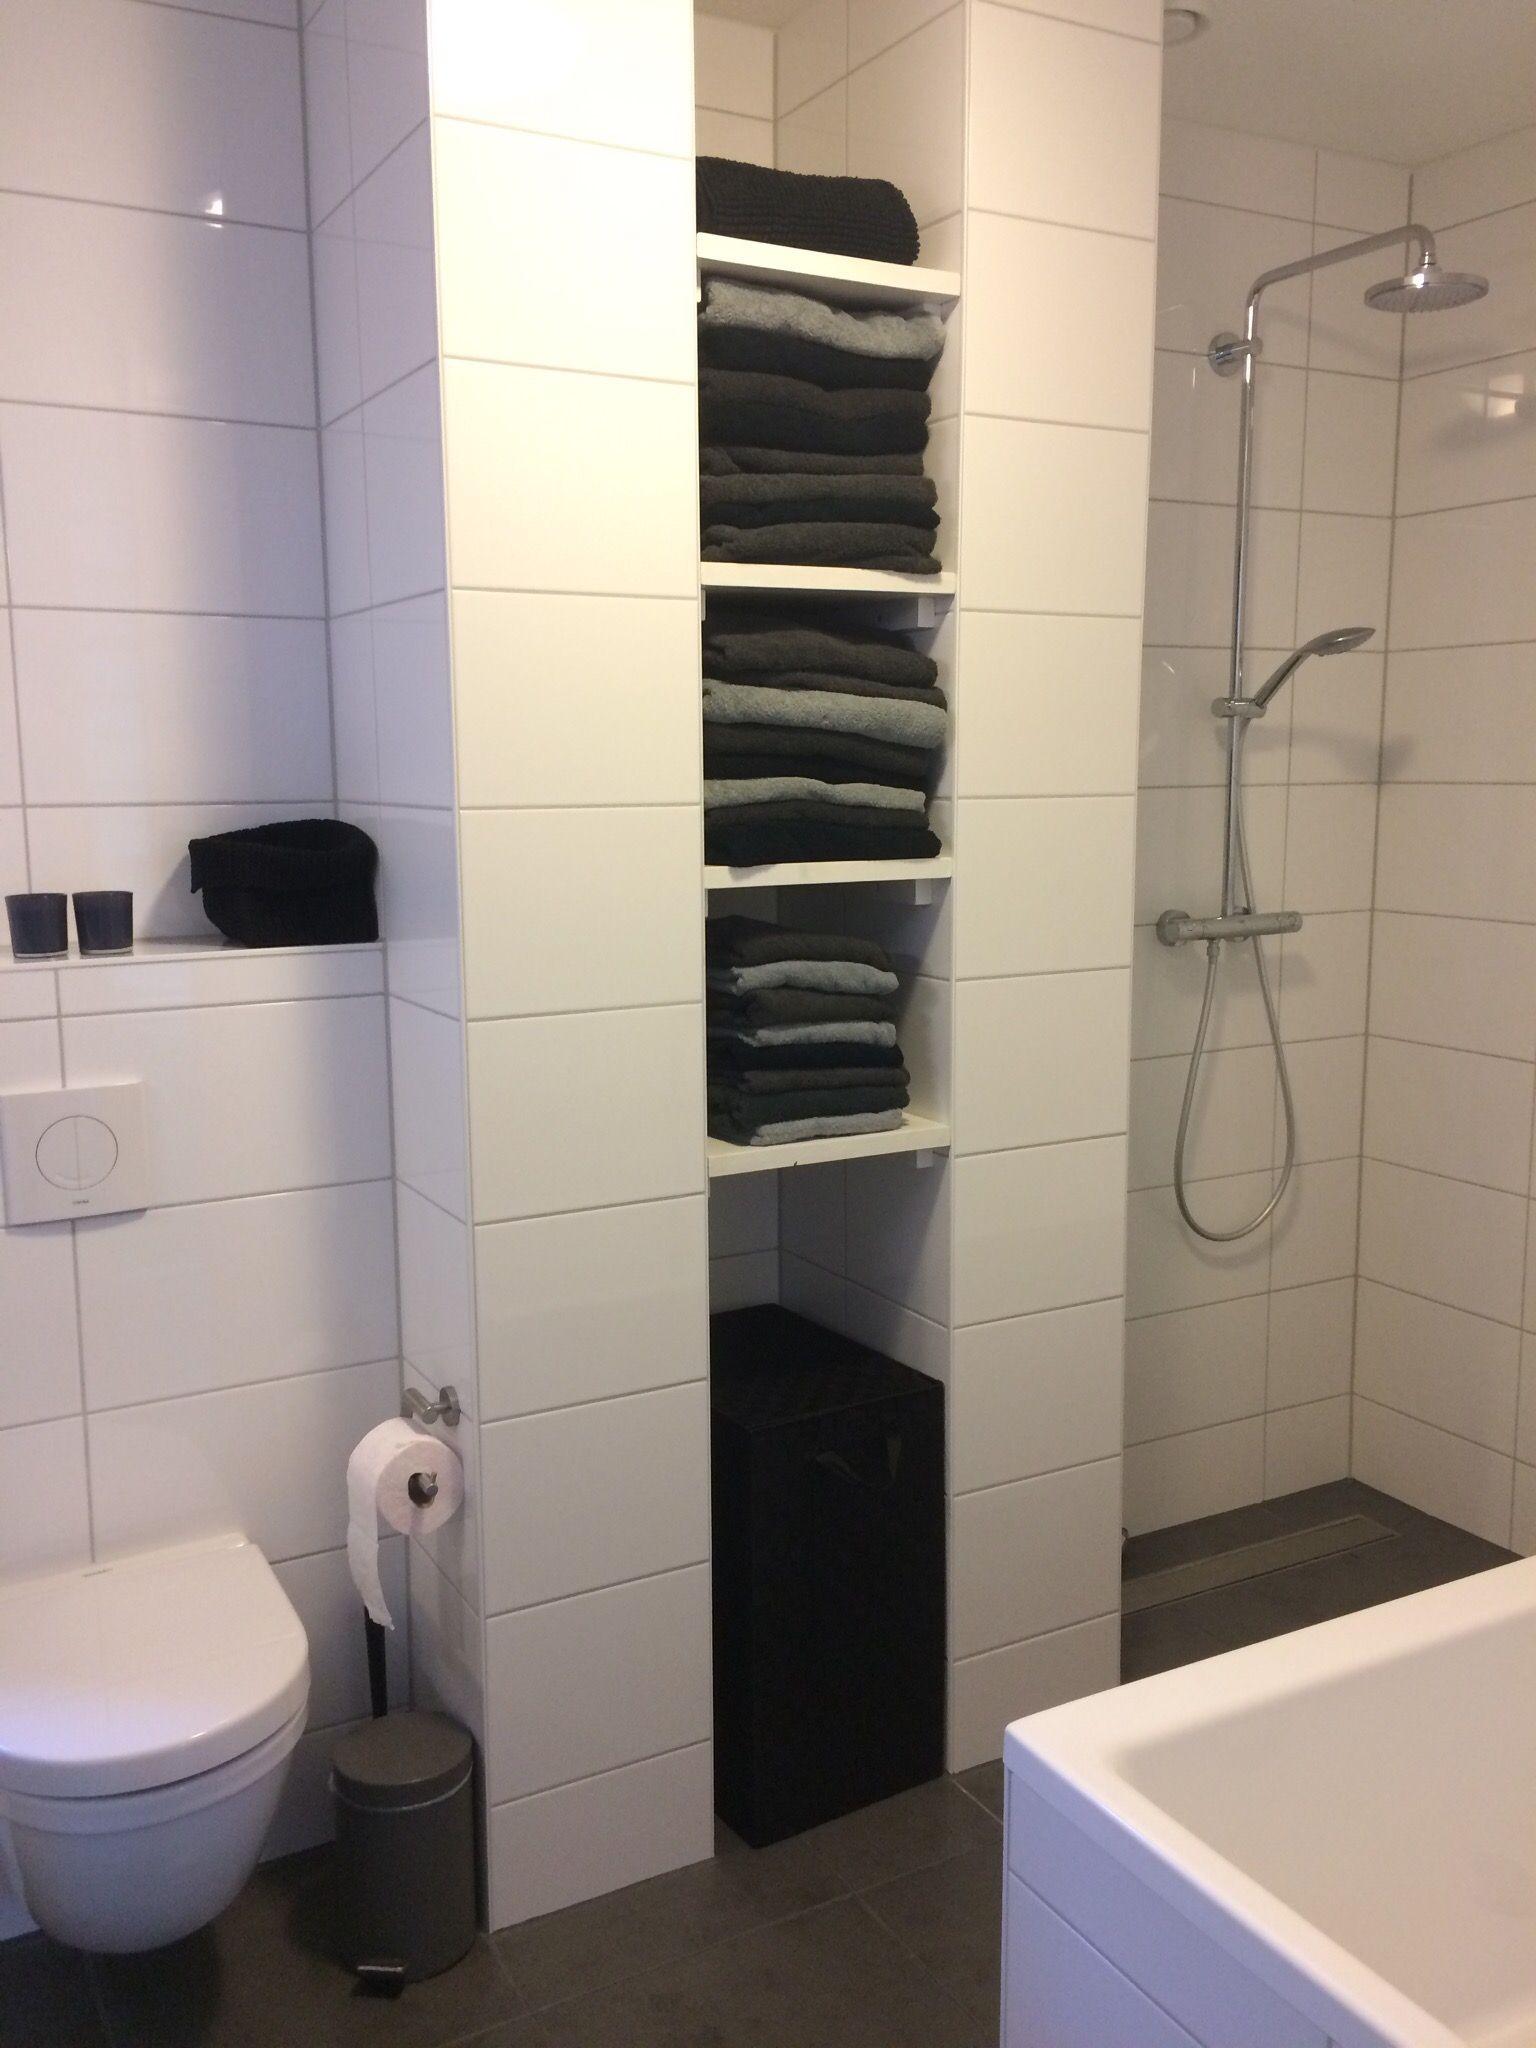 Moderne badkamer zwart wit badkamer nis nissen nisje handdoeken zwart wit pinterest - Moderne badkamer betegelde vloer ...